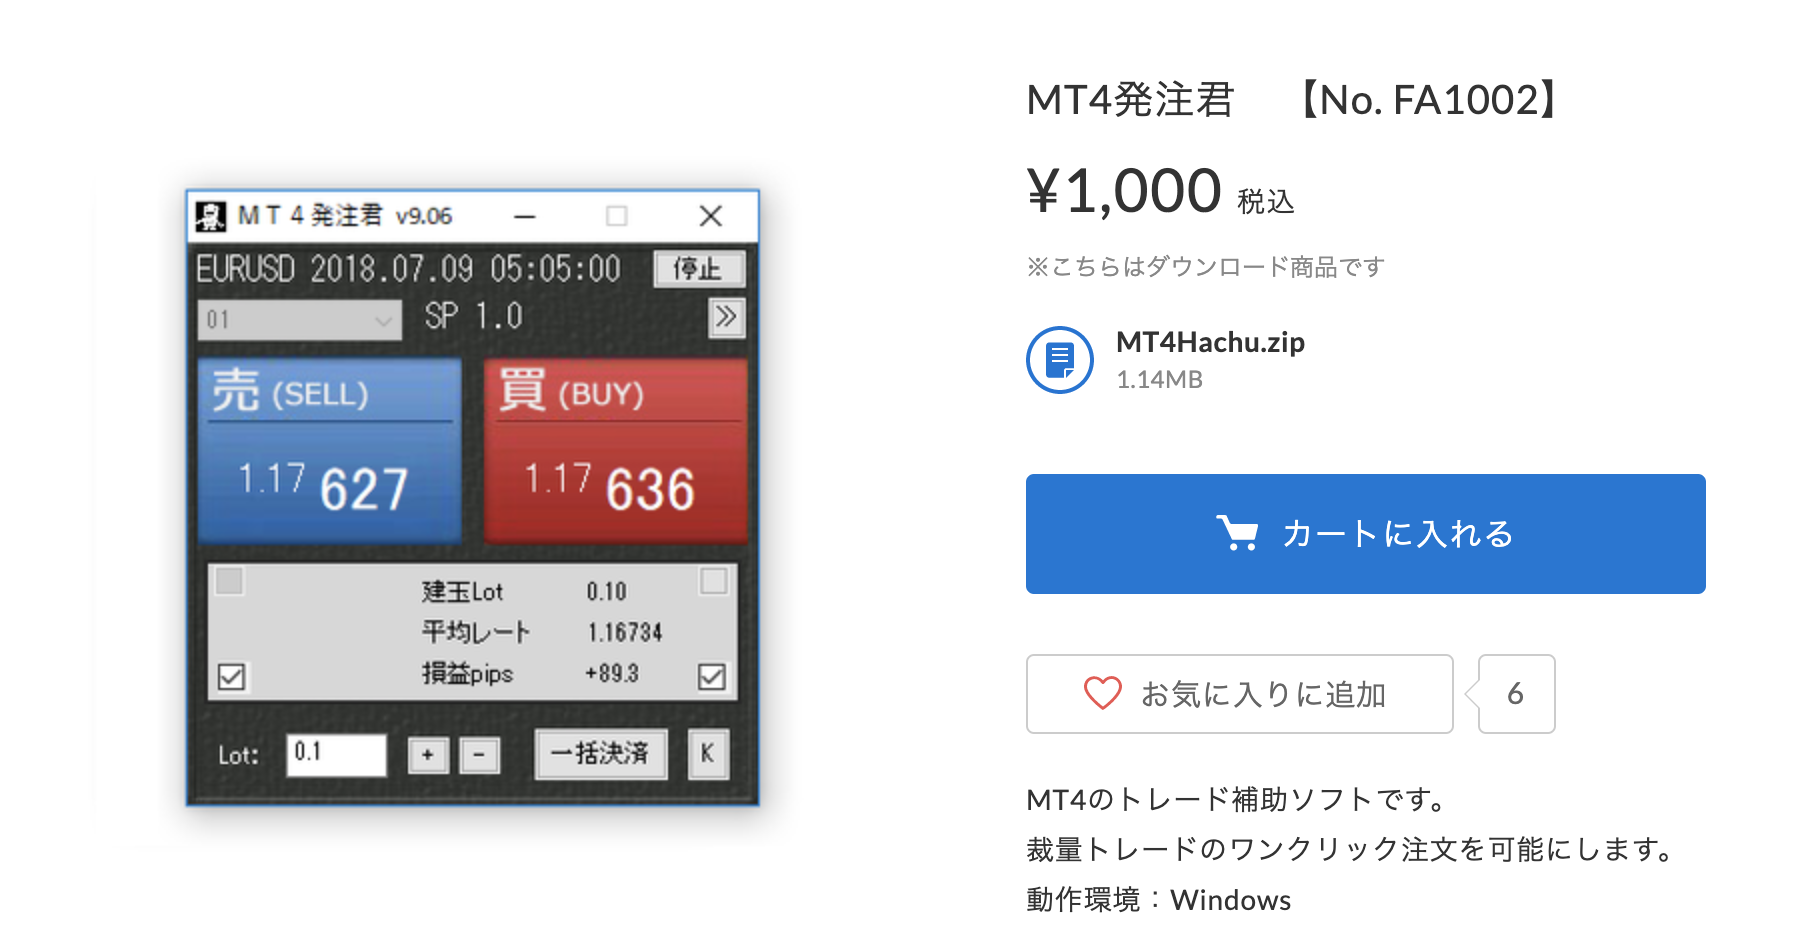 mt4 発注 君 使い方